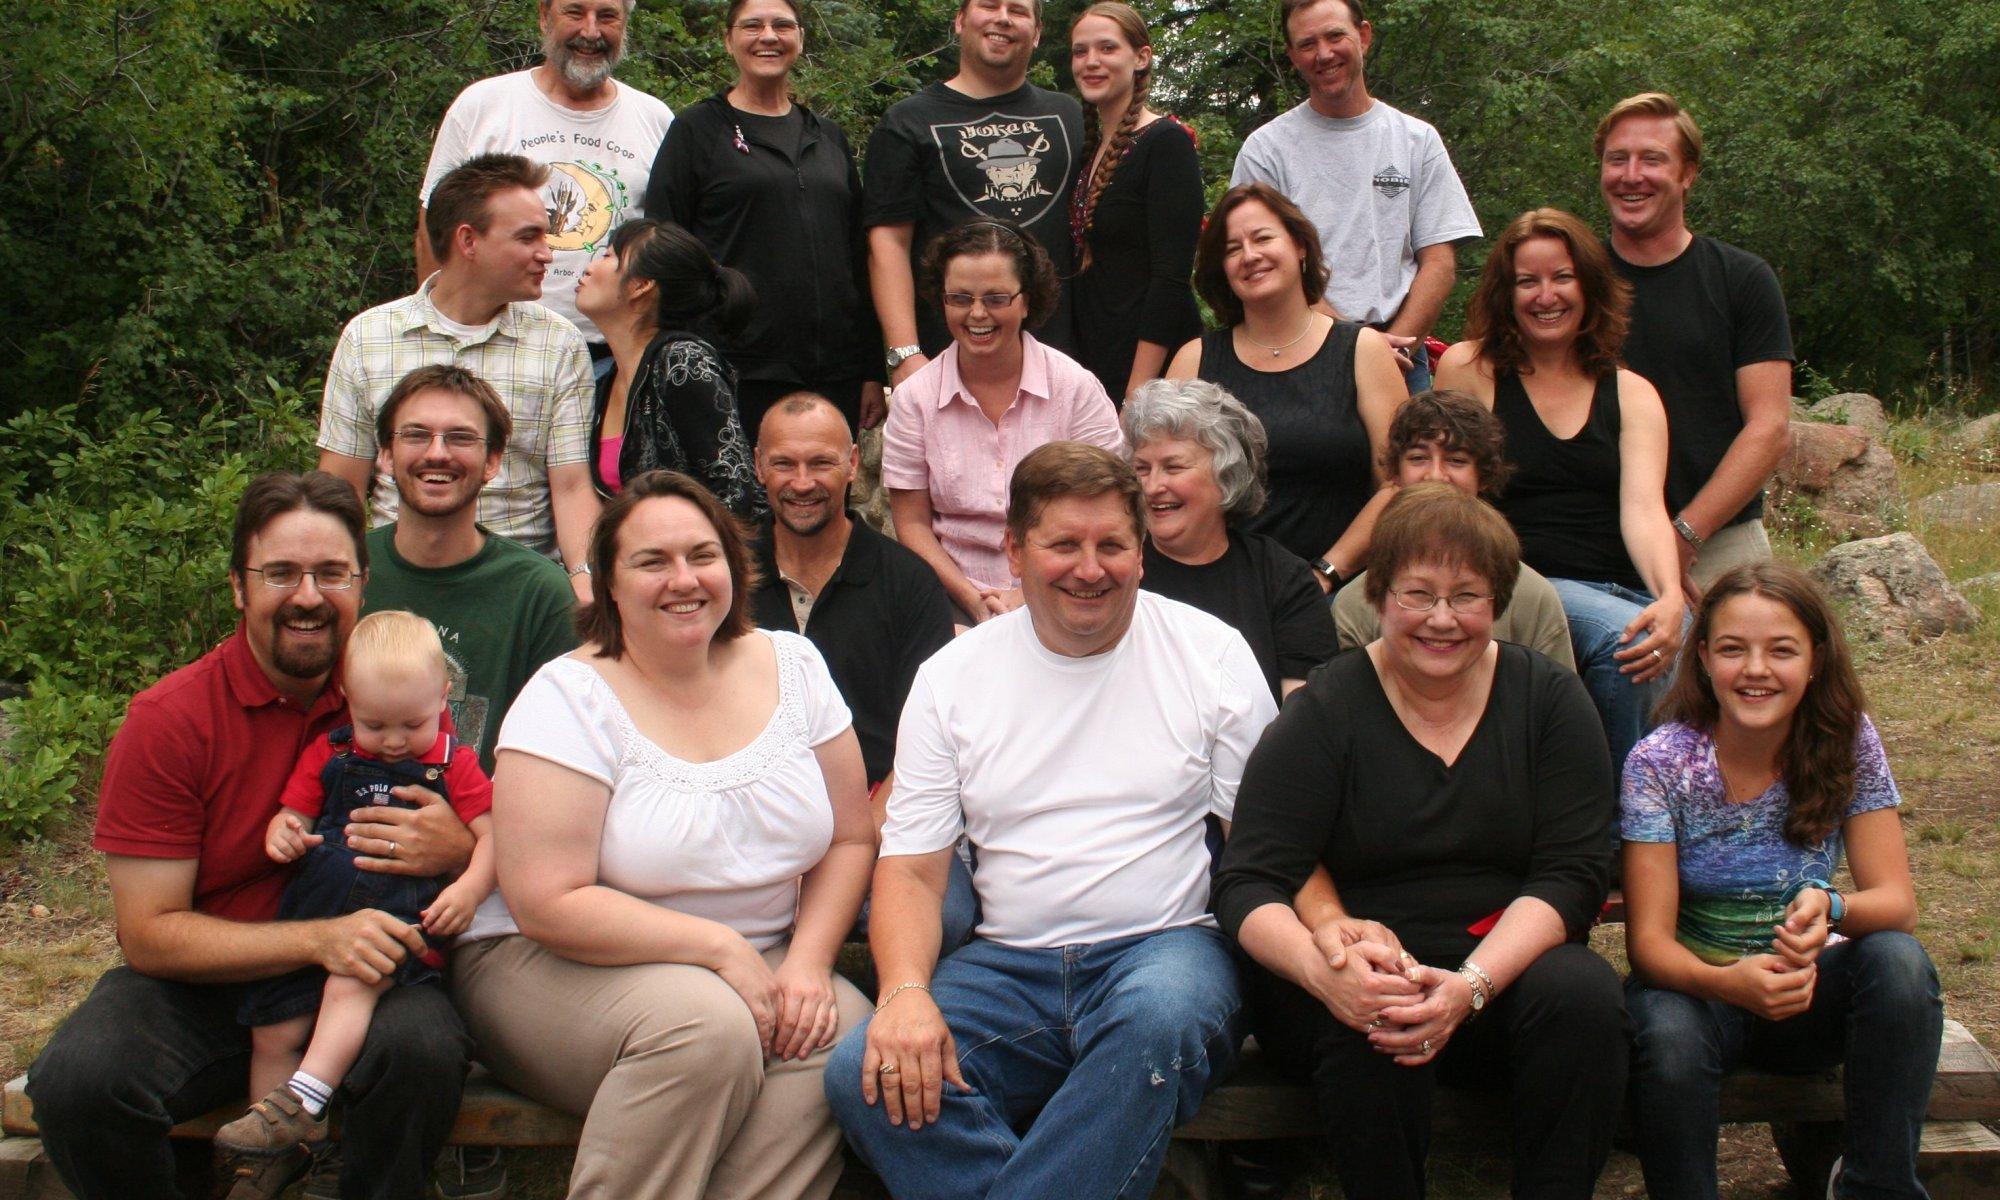 Top: Dave, Ellen, Tommy, Gretchen, Bill; Middle-top: Drew, Geebi, Jean, Kristin, Jenny, Thadeus; Middle-bottom: Bret, John, Jean Ann, Billy; Bottom: Rob, Clare, Spencer, Grant, Jackie, Shannon